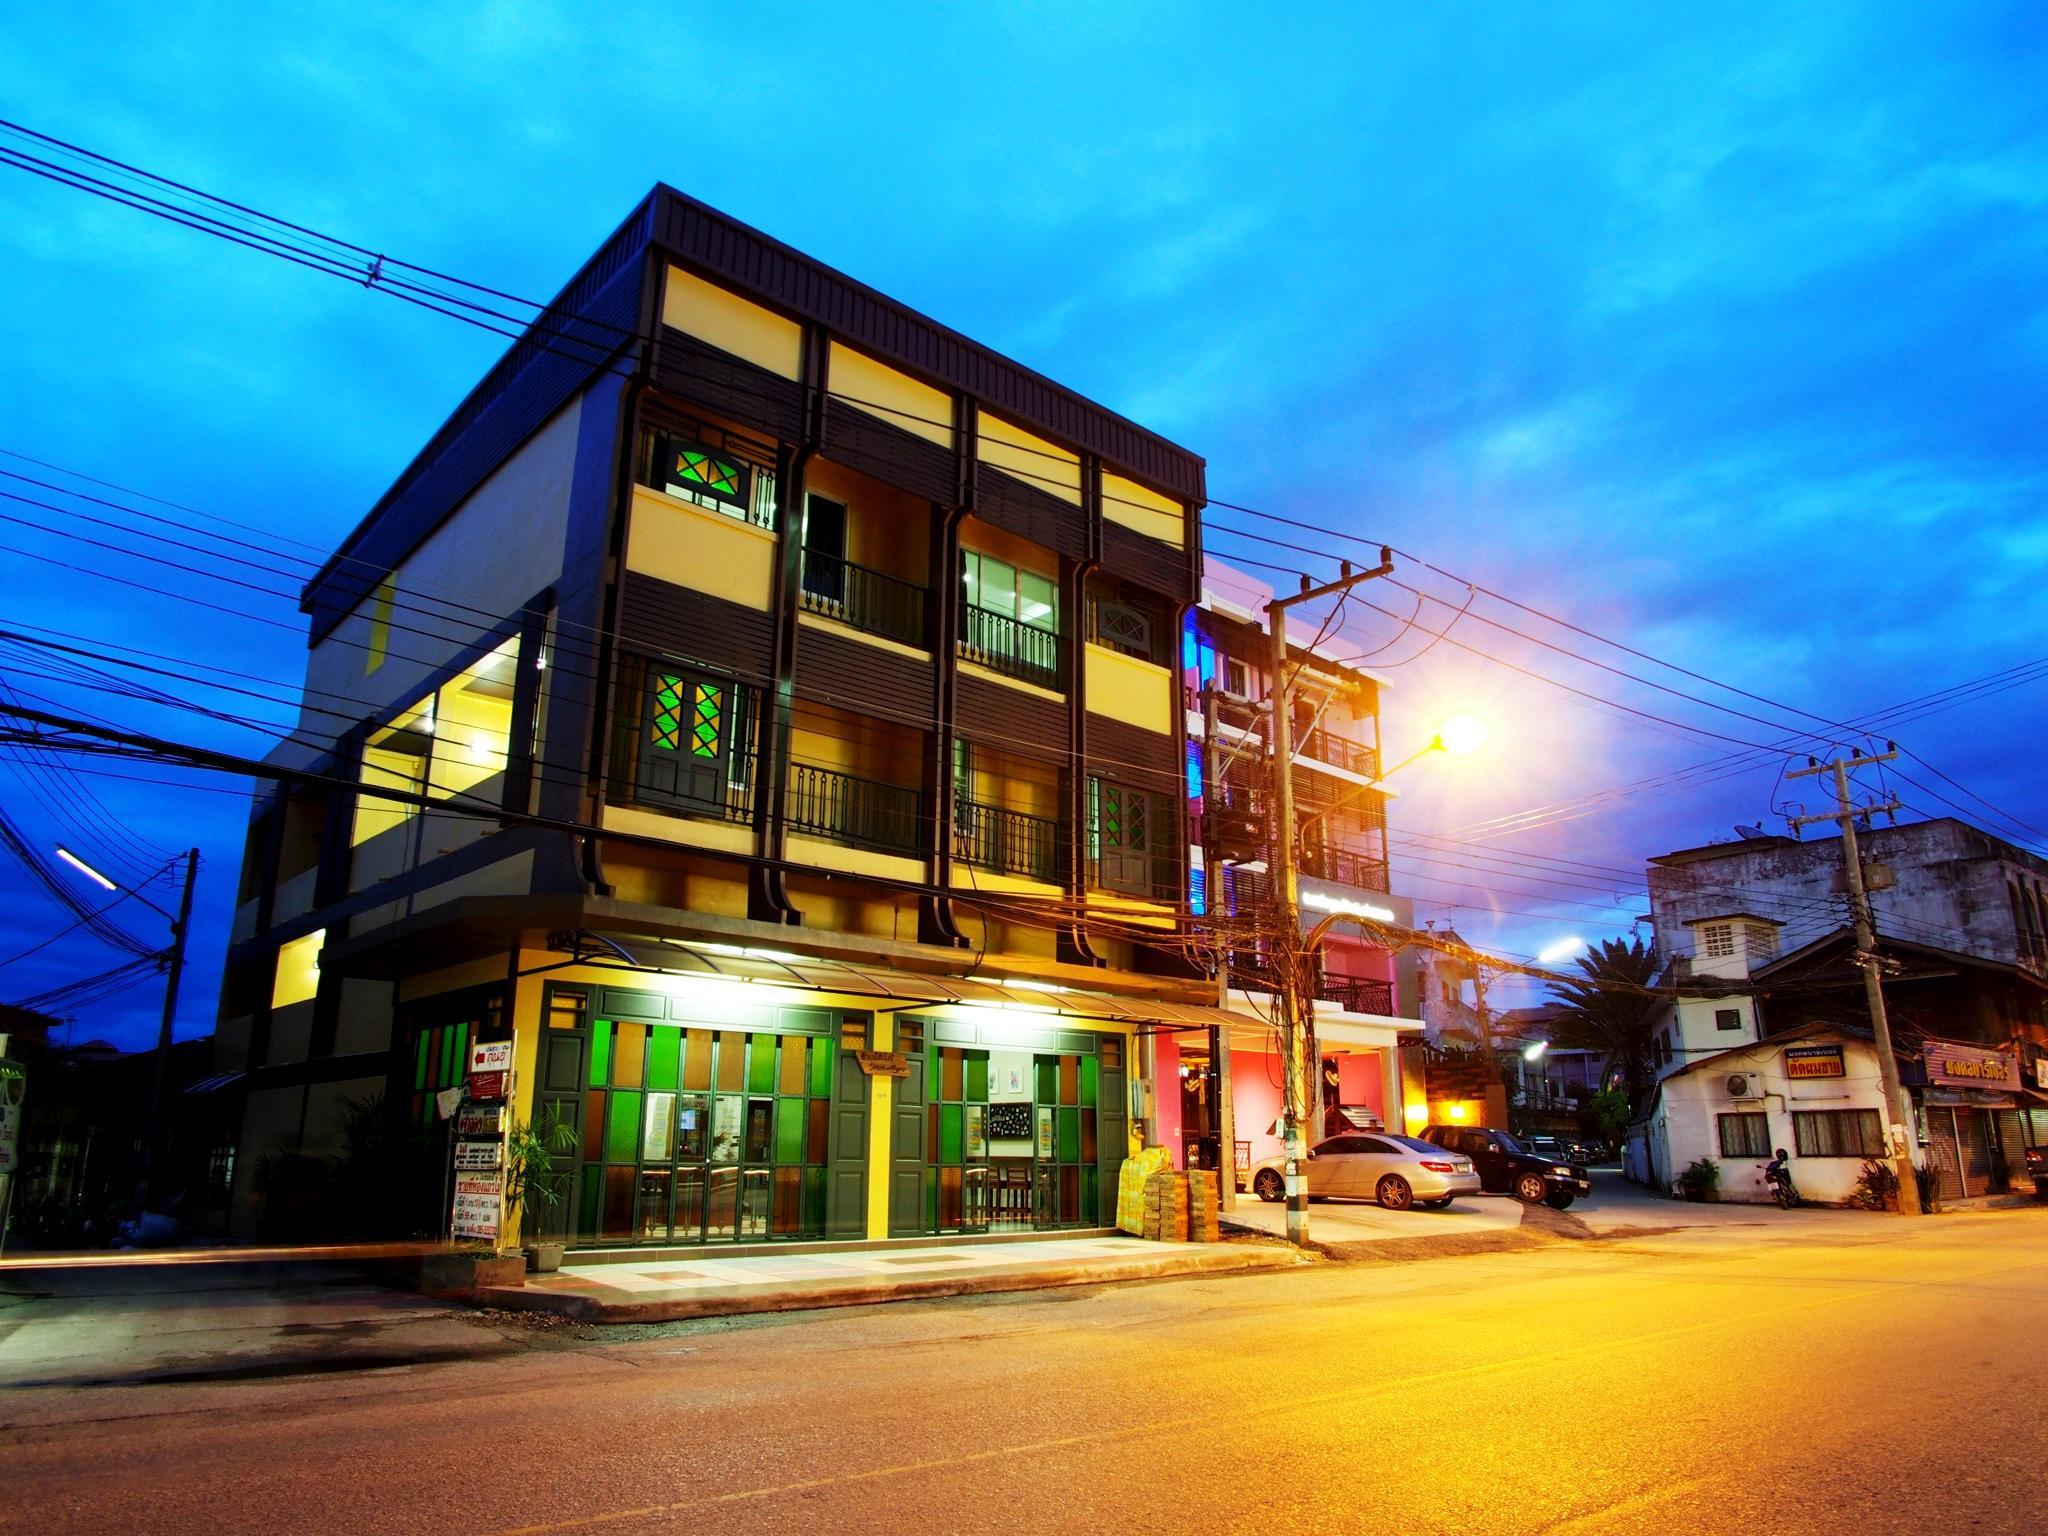 Reviews อินน์ดิโก เชียง ใหม่ (Inndigo Chiang Mai) ราคาประหยัด